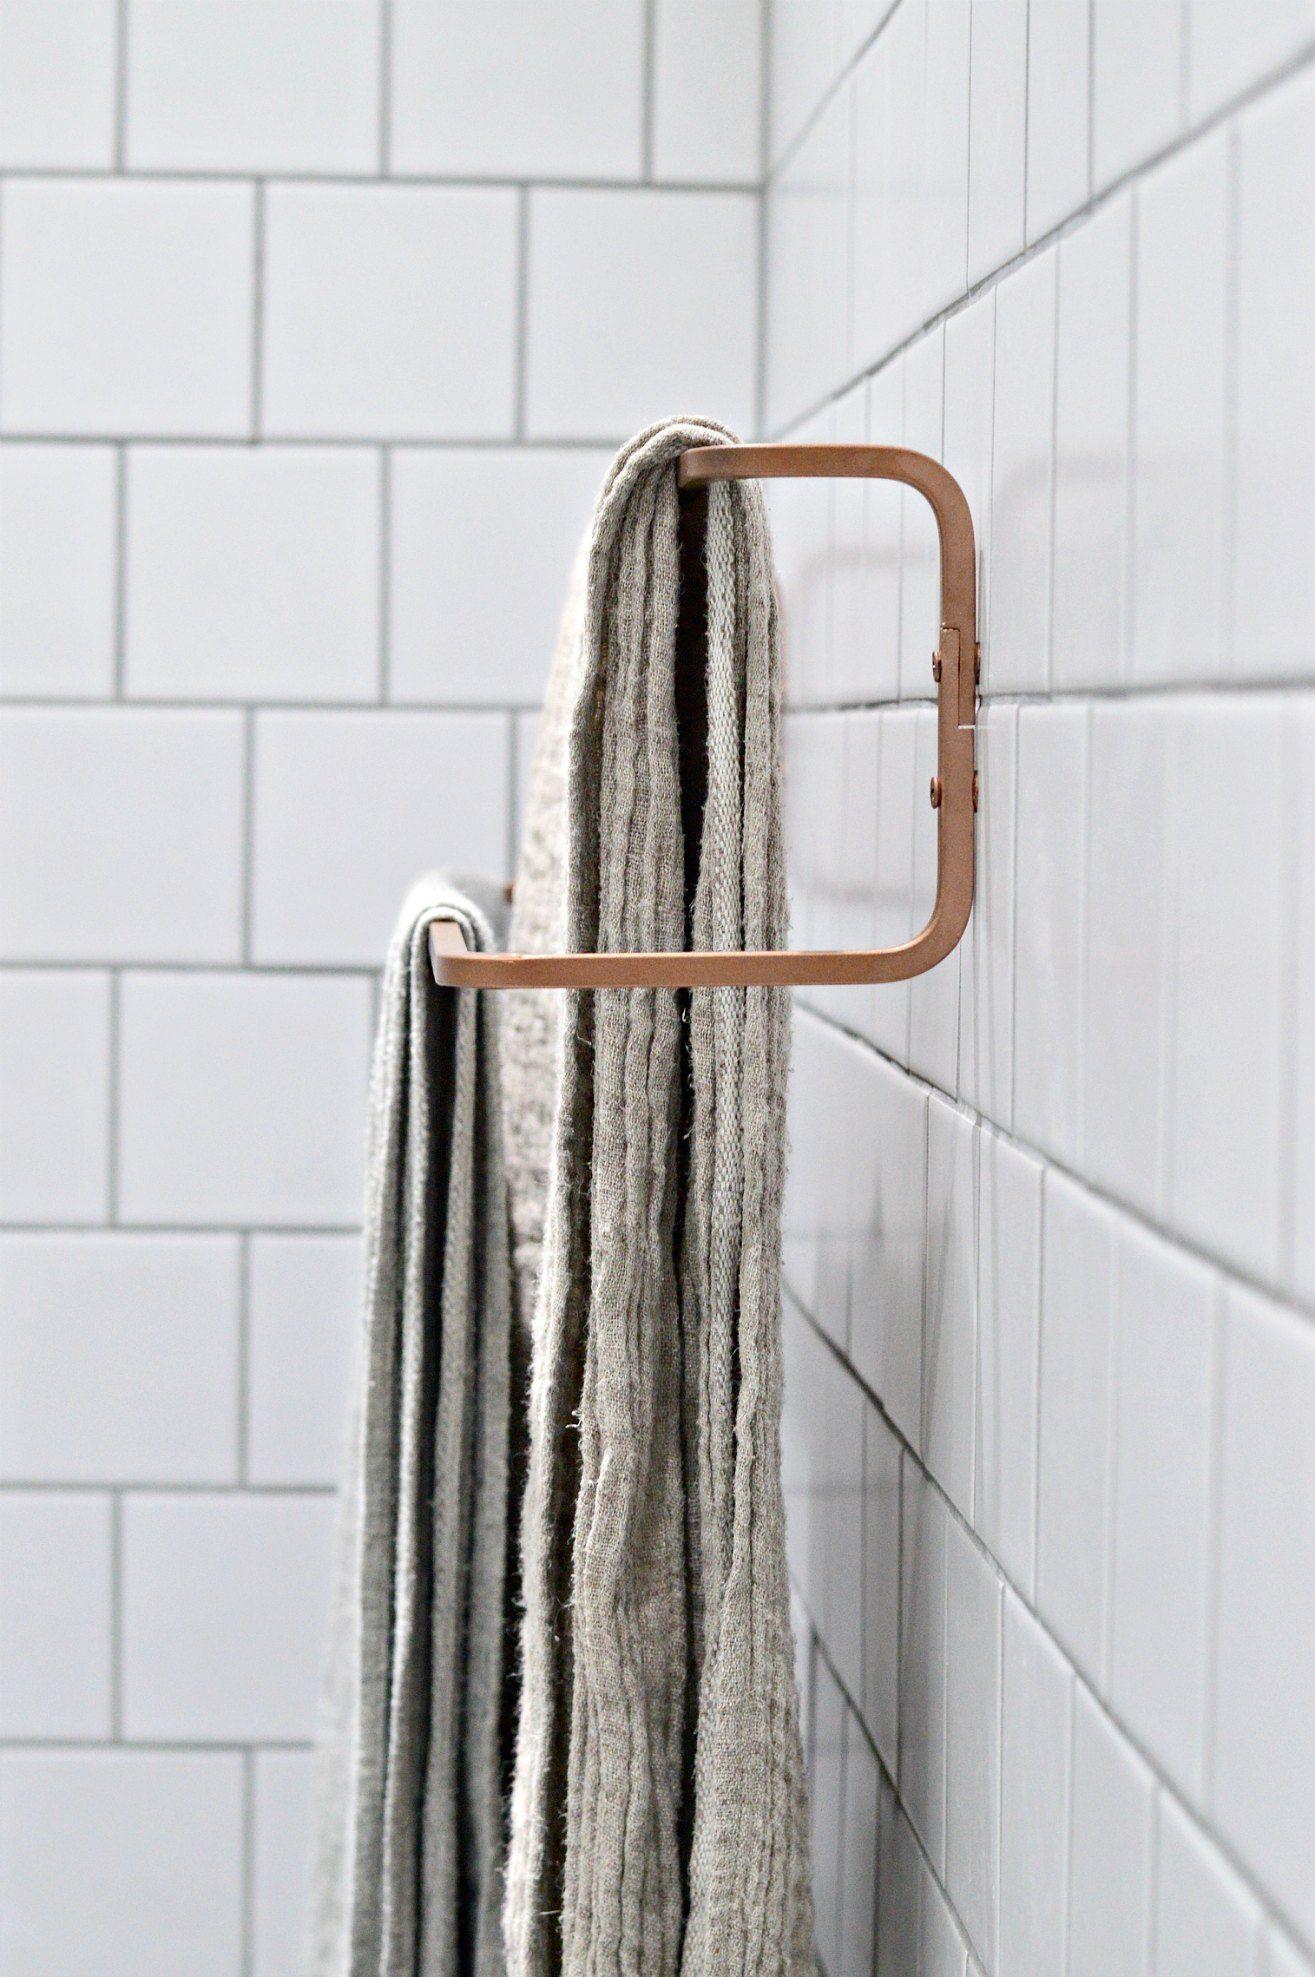 10 Minute Diy Ikea Towel Rail Hack